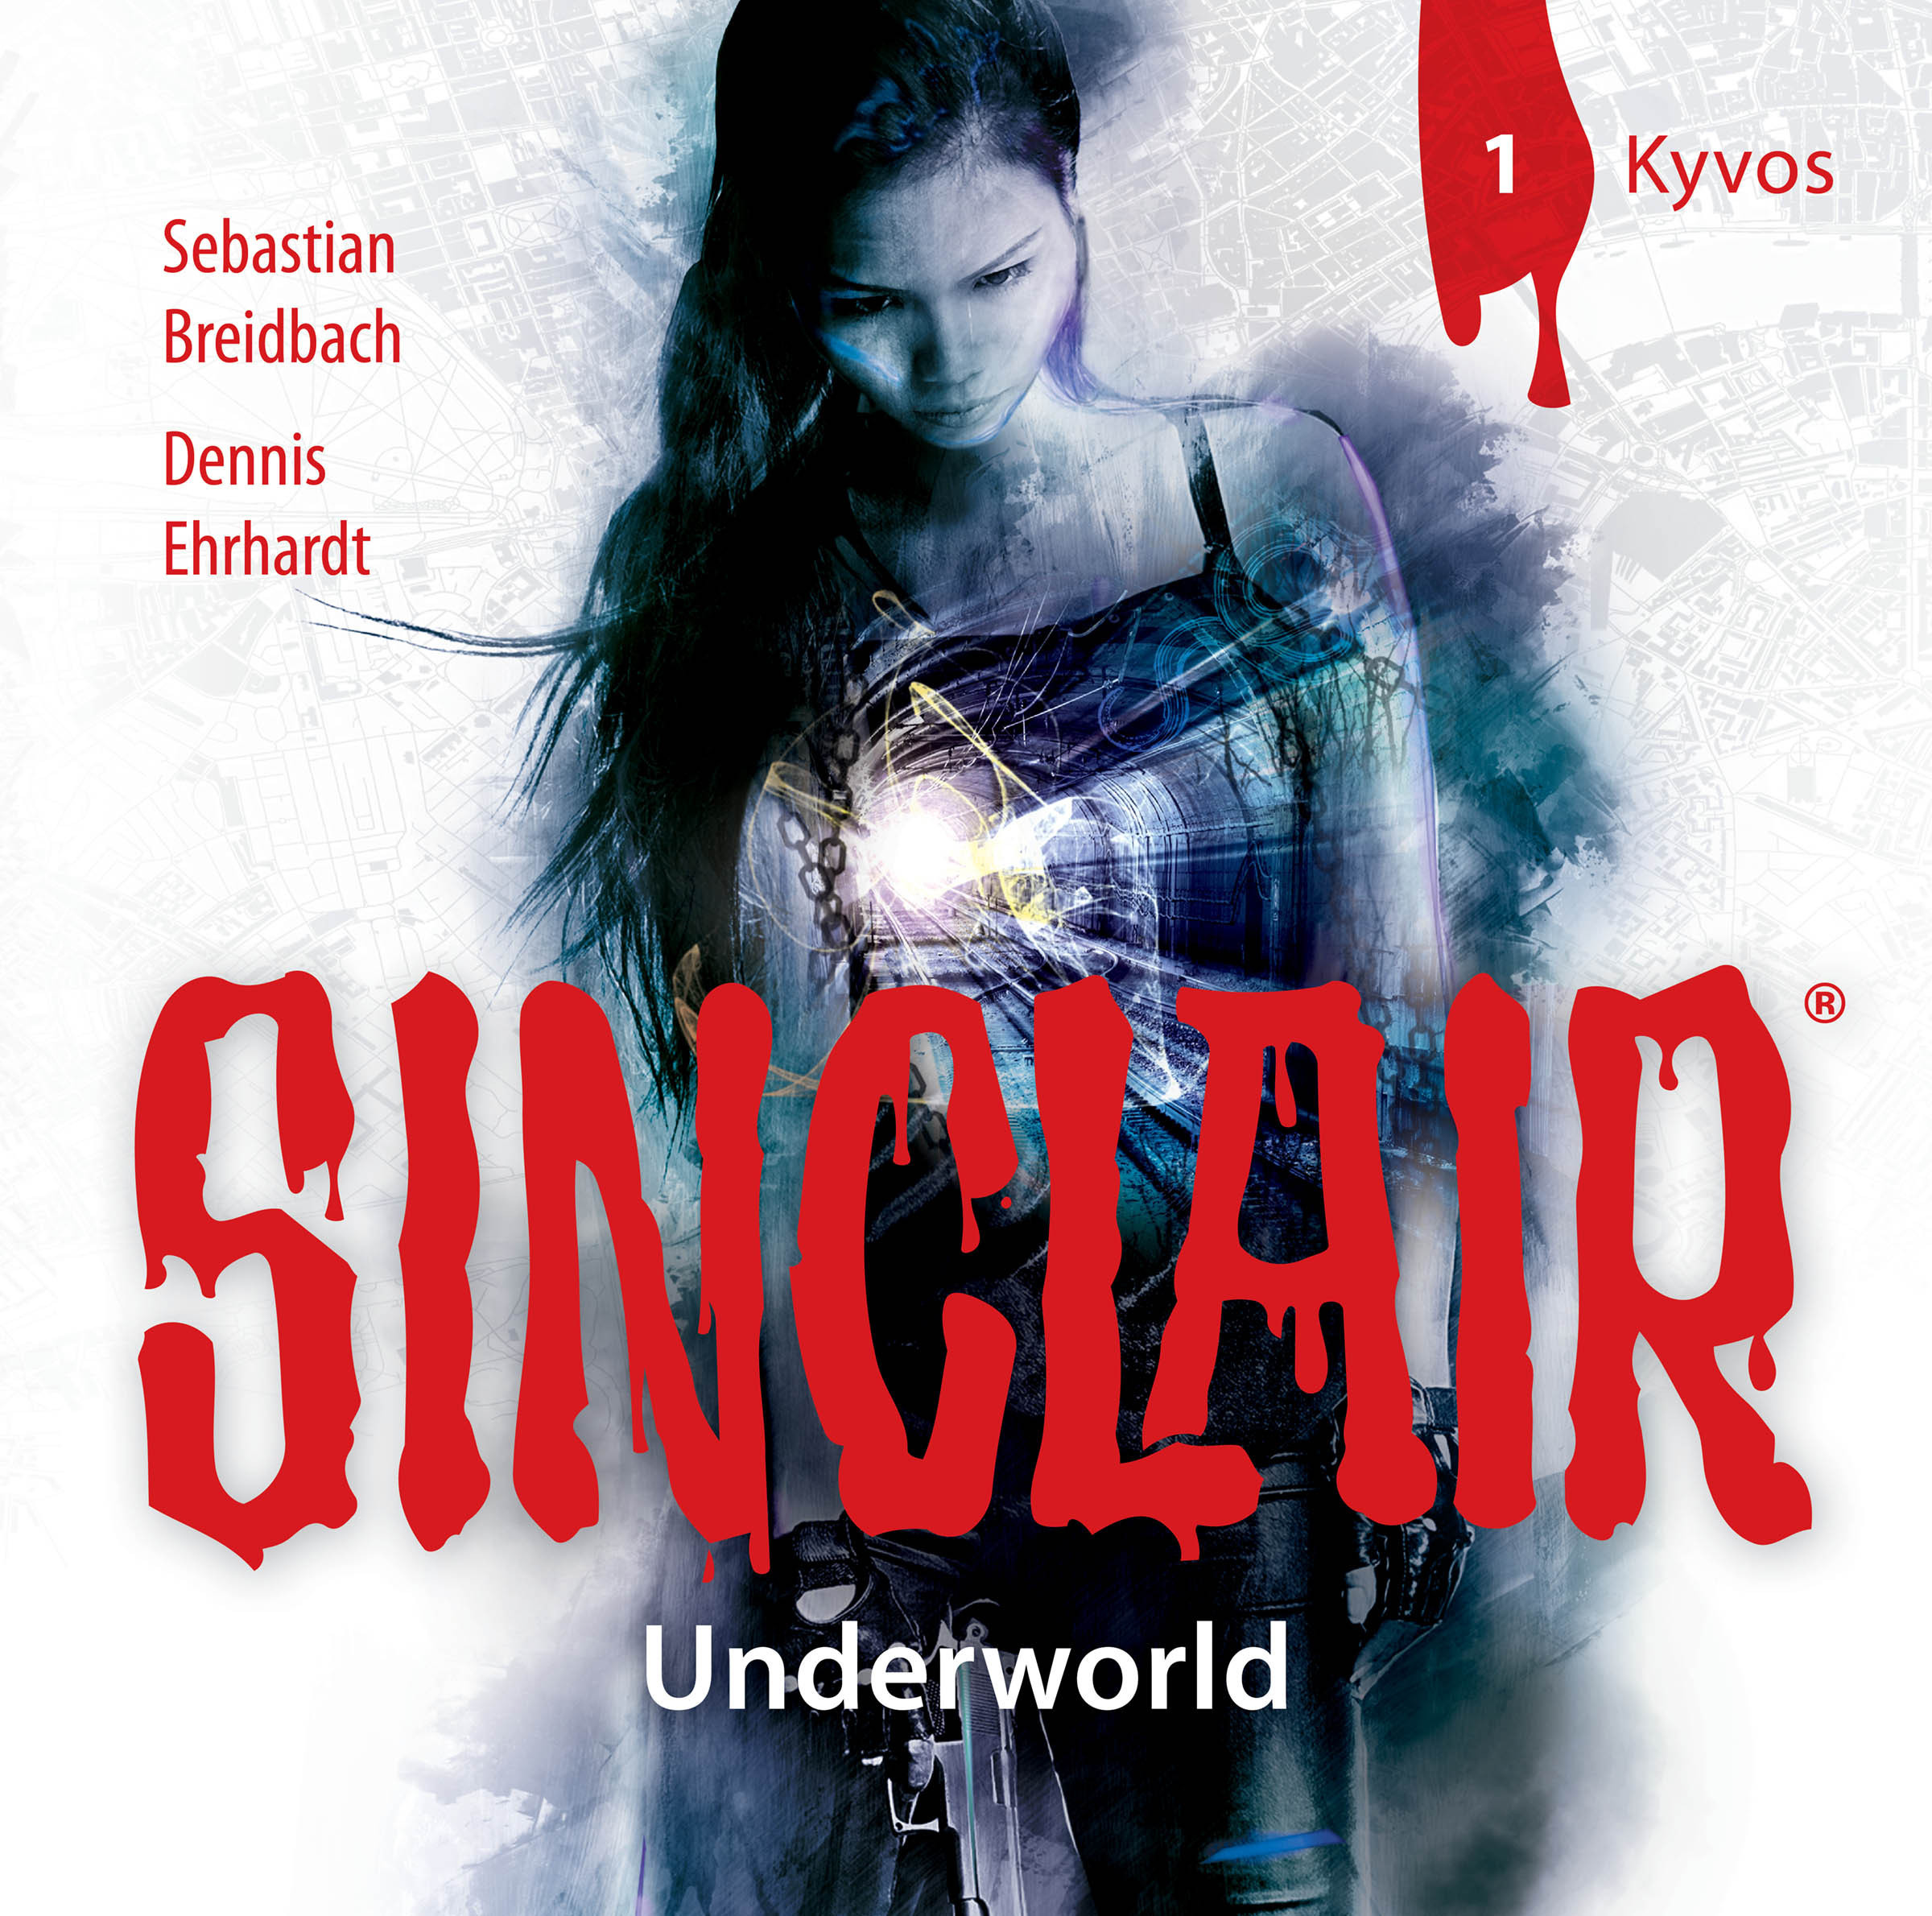 ABO SINCLAIR - Underworld